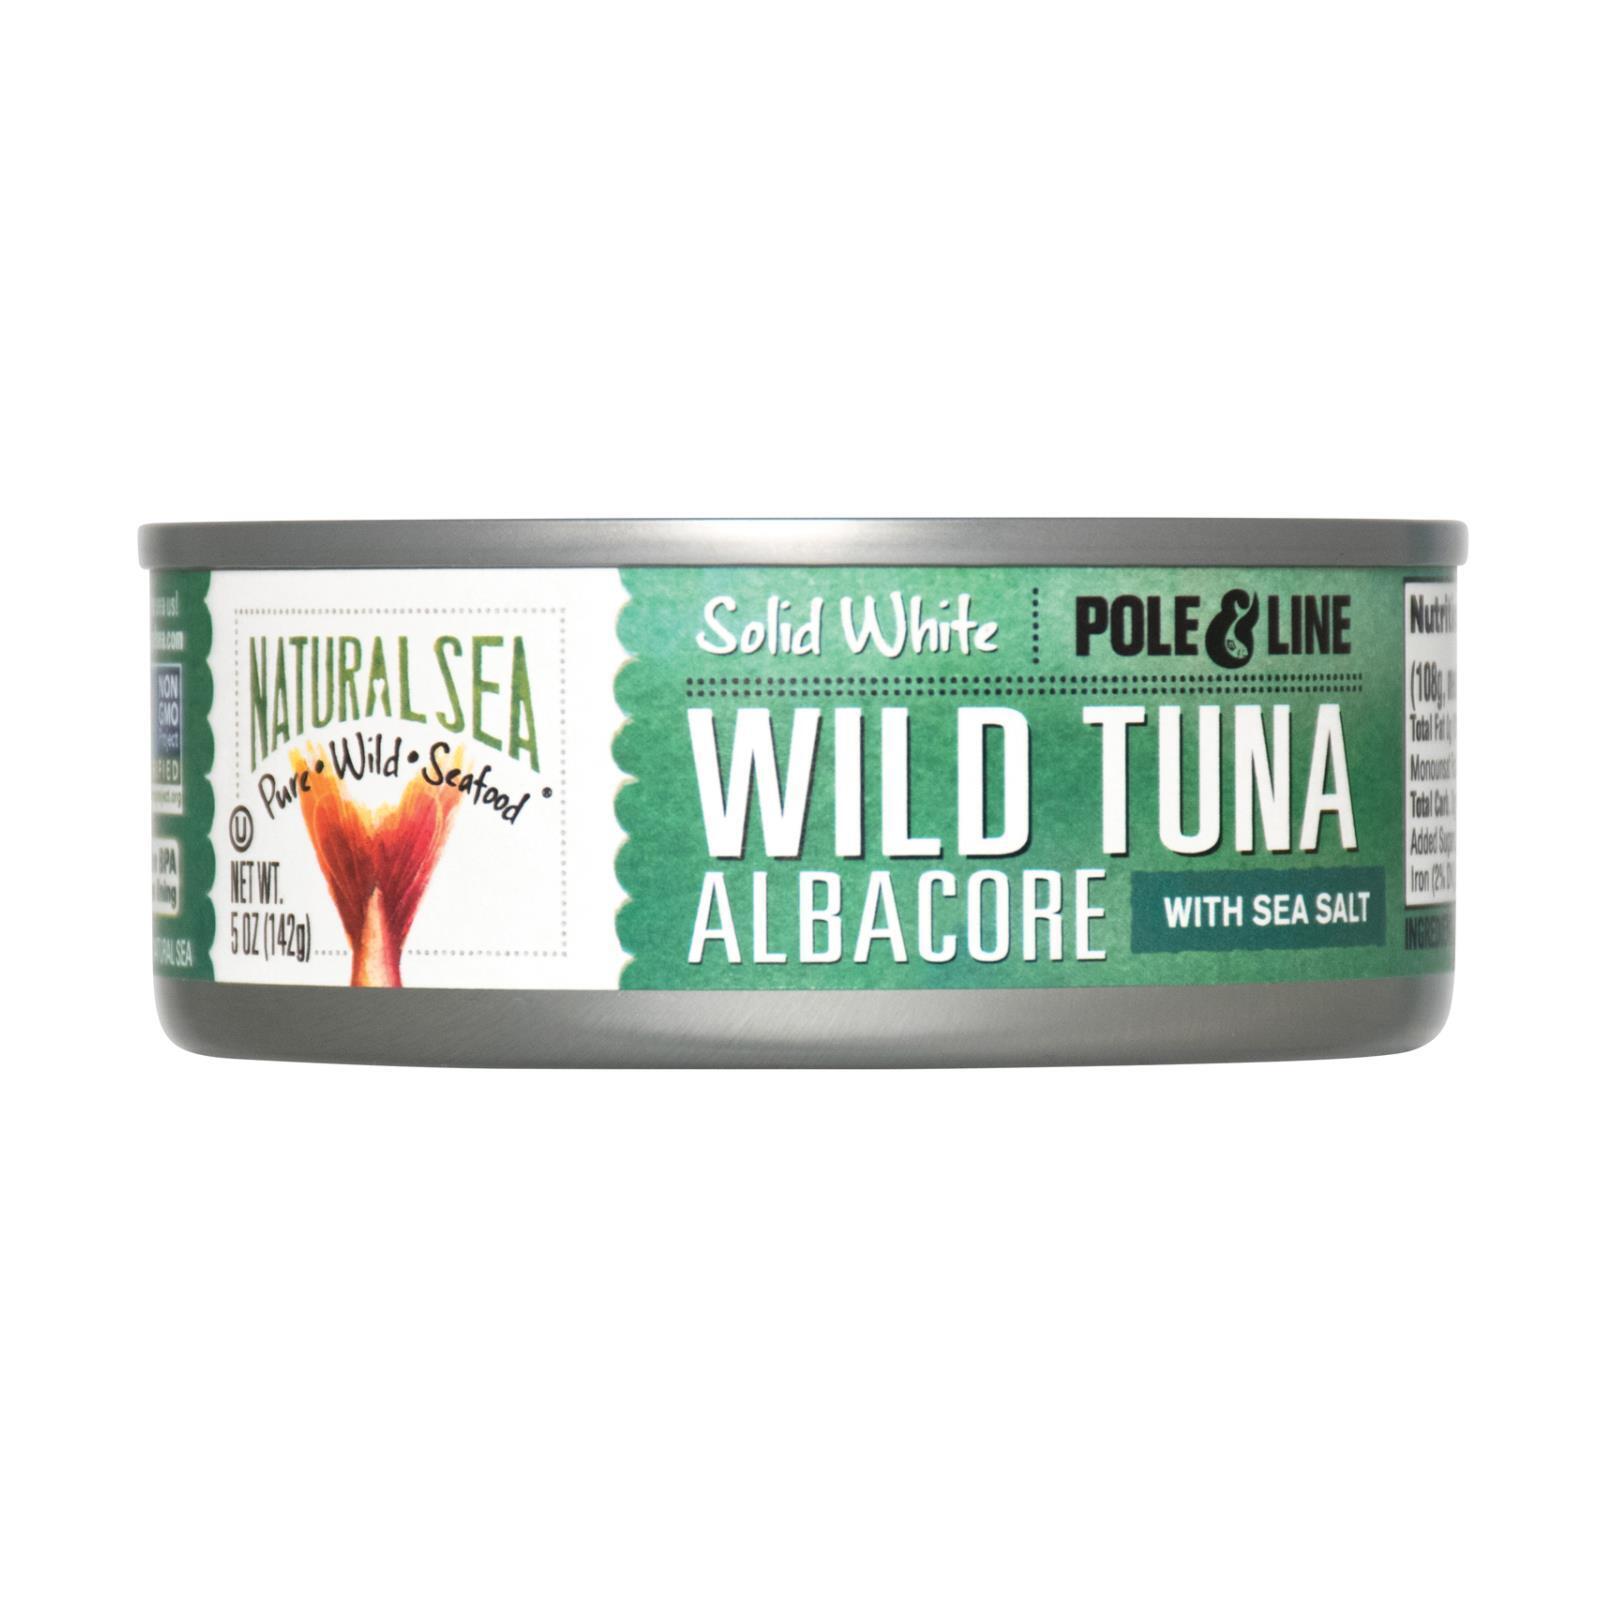 Natural Sea Wild Albacore Tuna - With Sea Salt - Case of 12 - 5 oz.